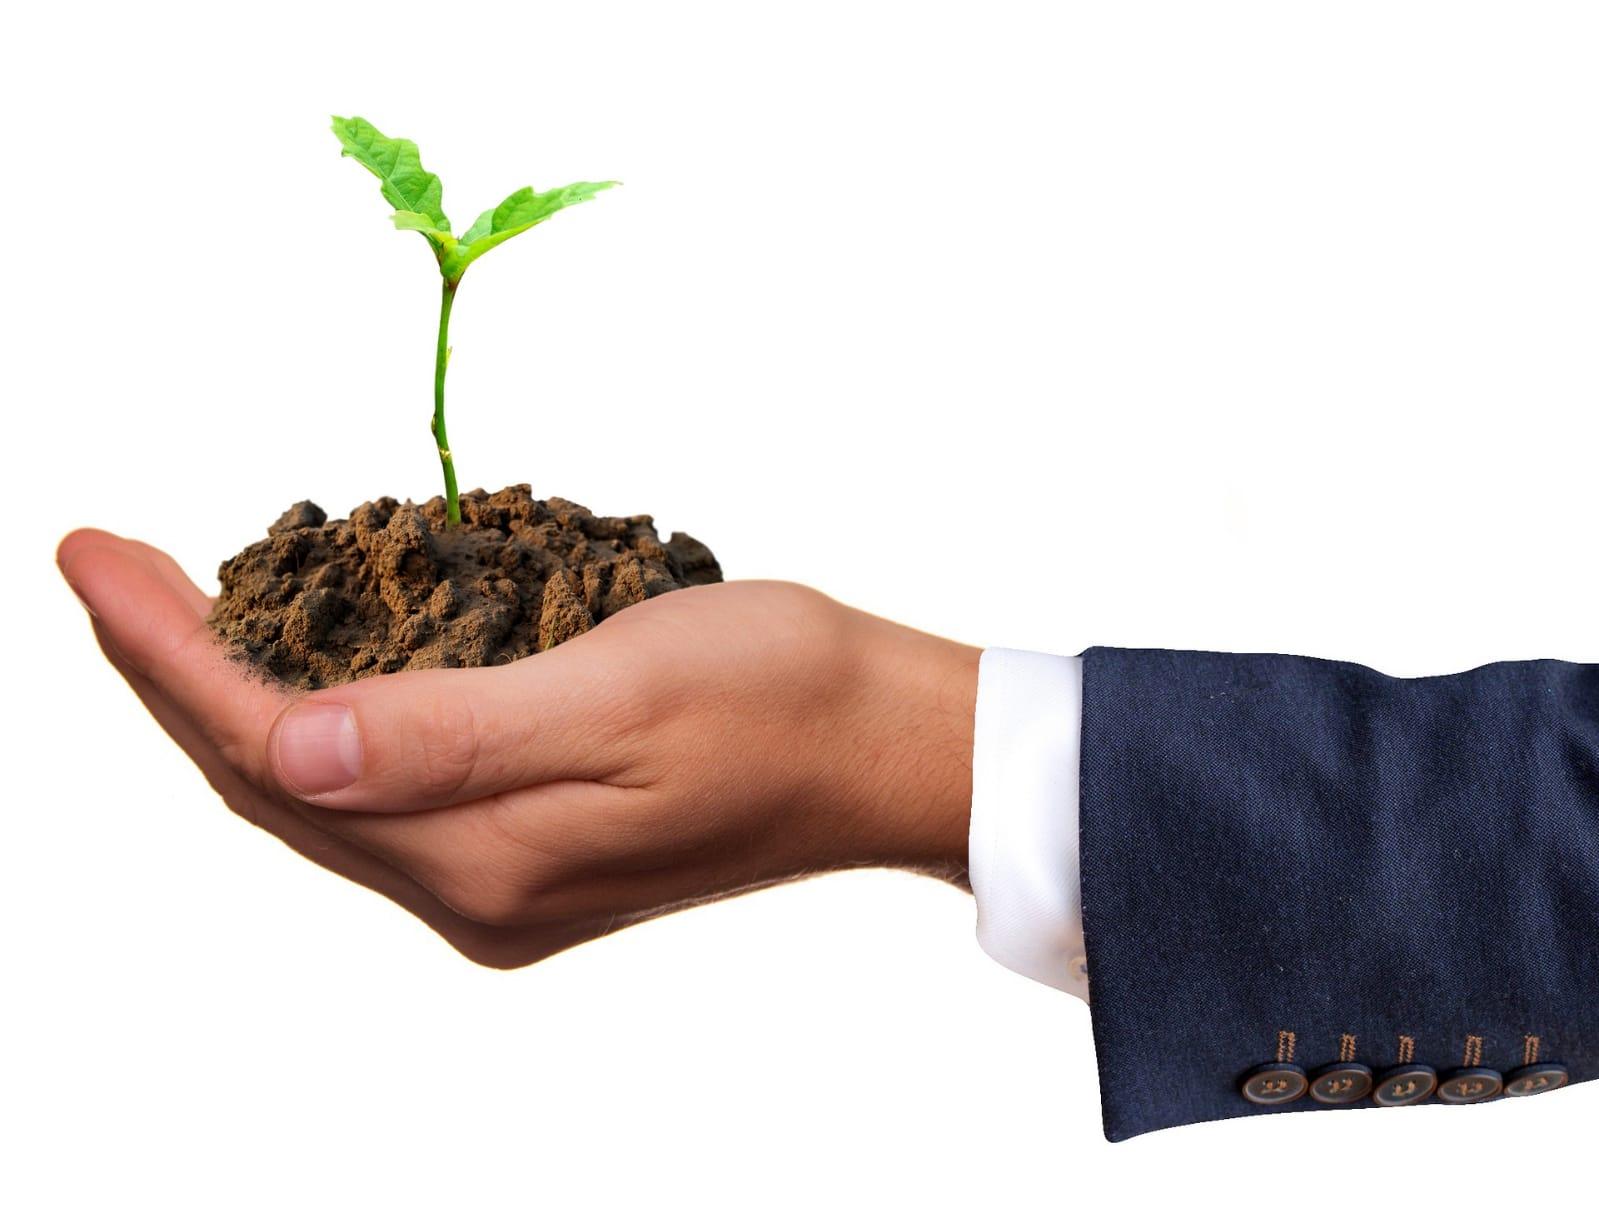 Ilustrasi memulai bisnis pertanian (SarahRichterArt/Pixabay)